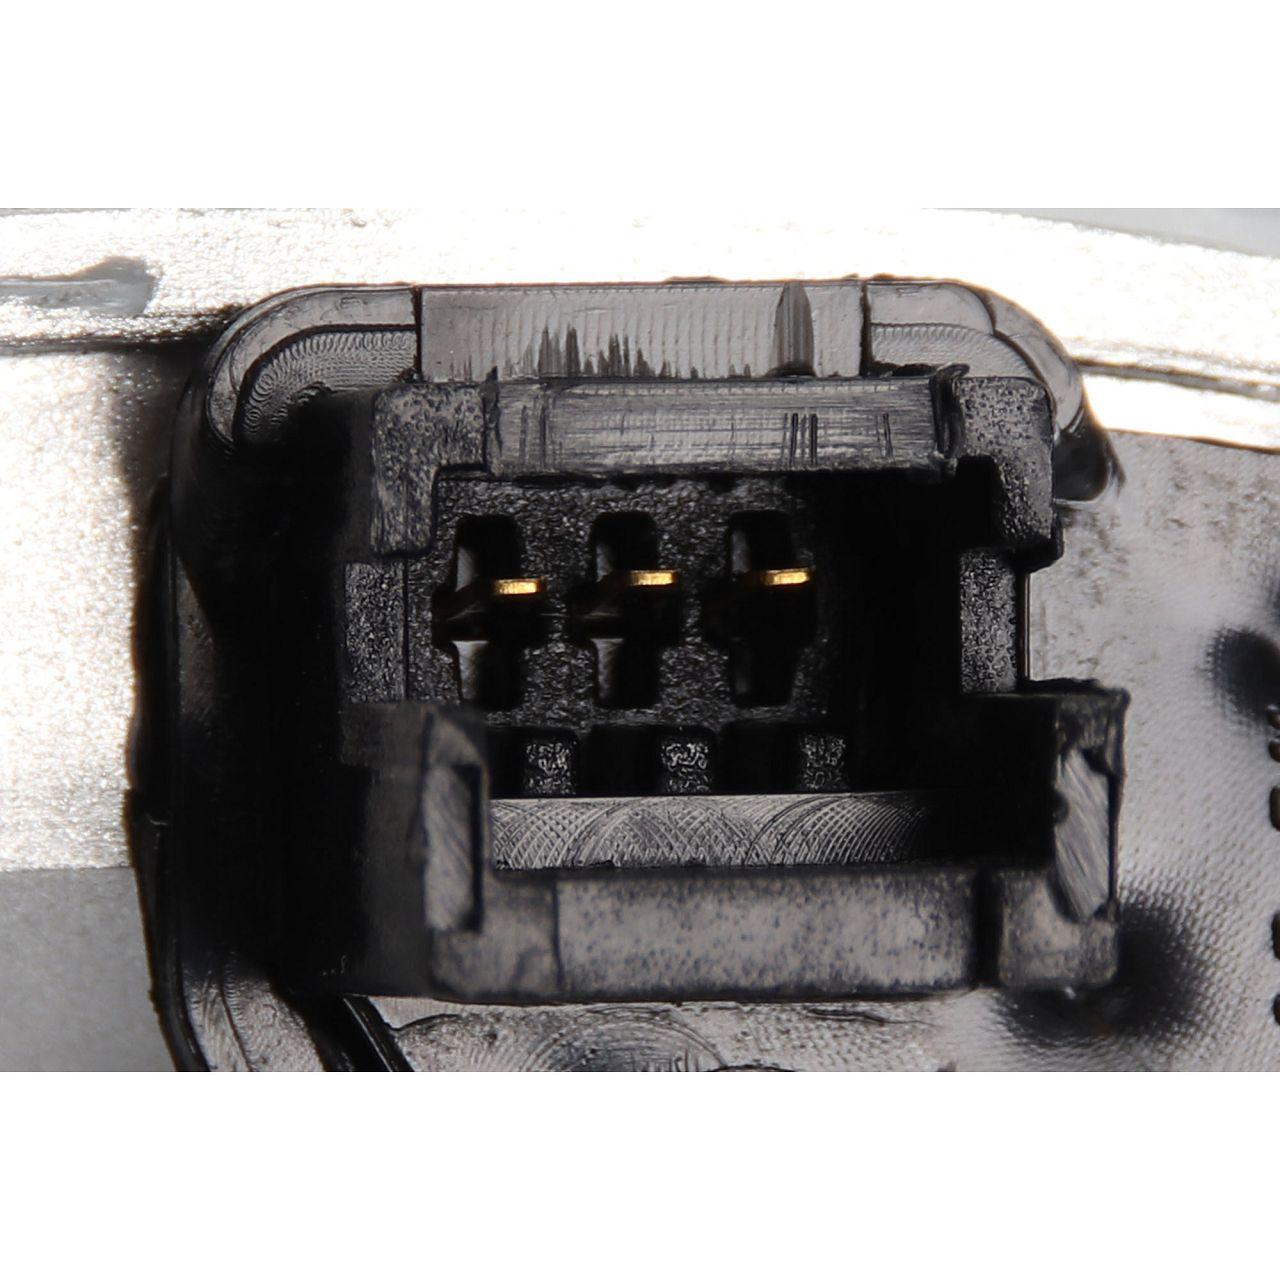 TYC Blinkleuchte Außenspiegel LED für SKODA OCTAVIA II (1Z) VW POLO (9N_) rechts